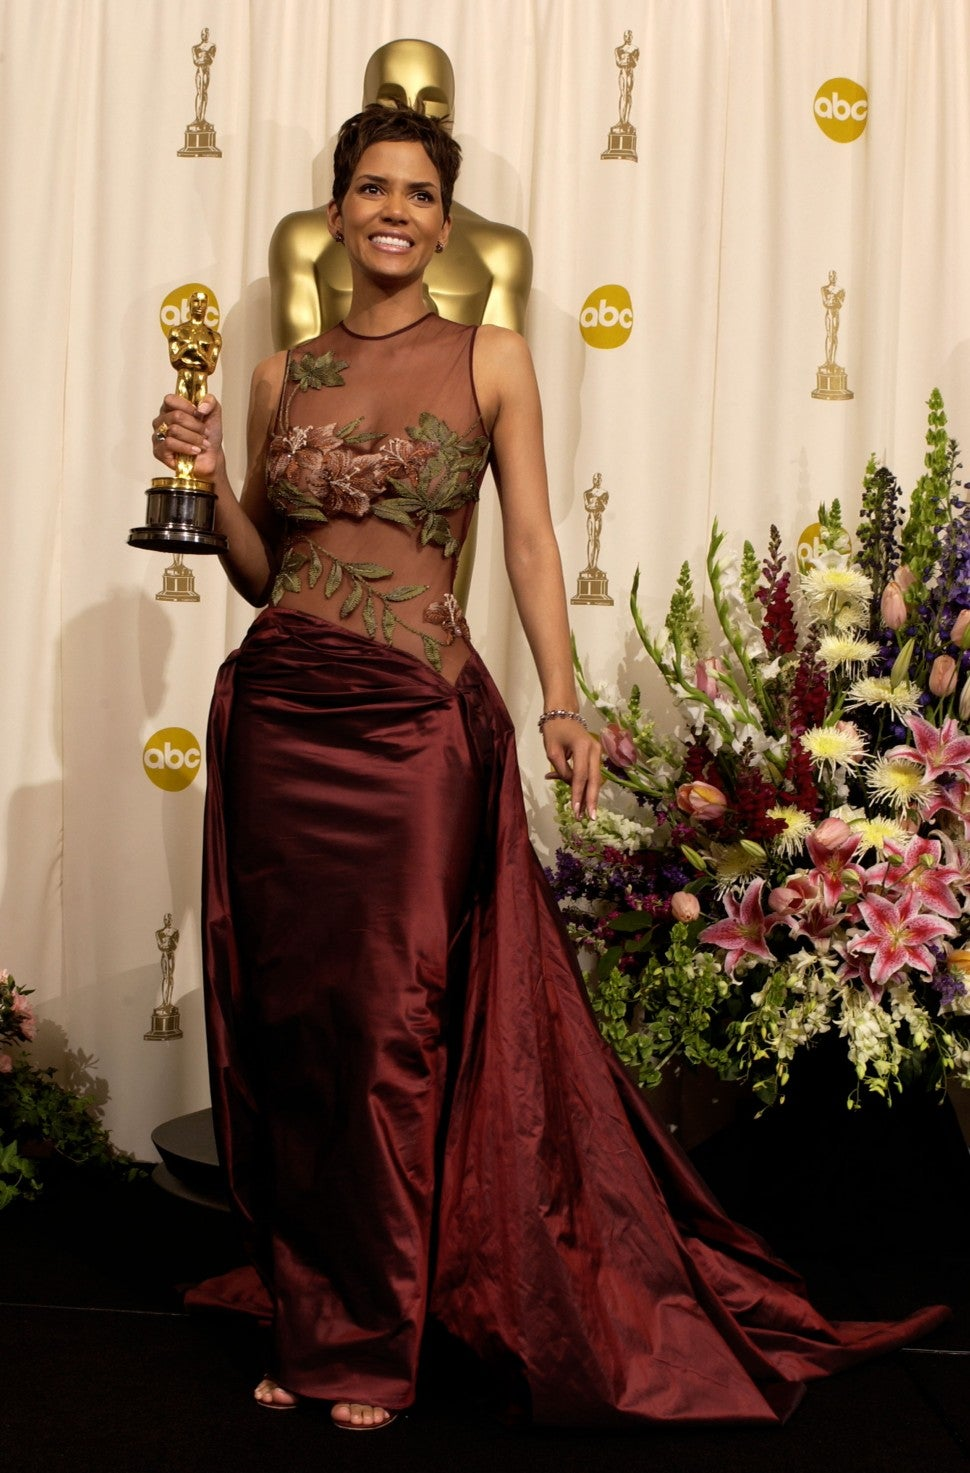 Halle Berry Oscars 2002 dress